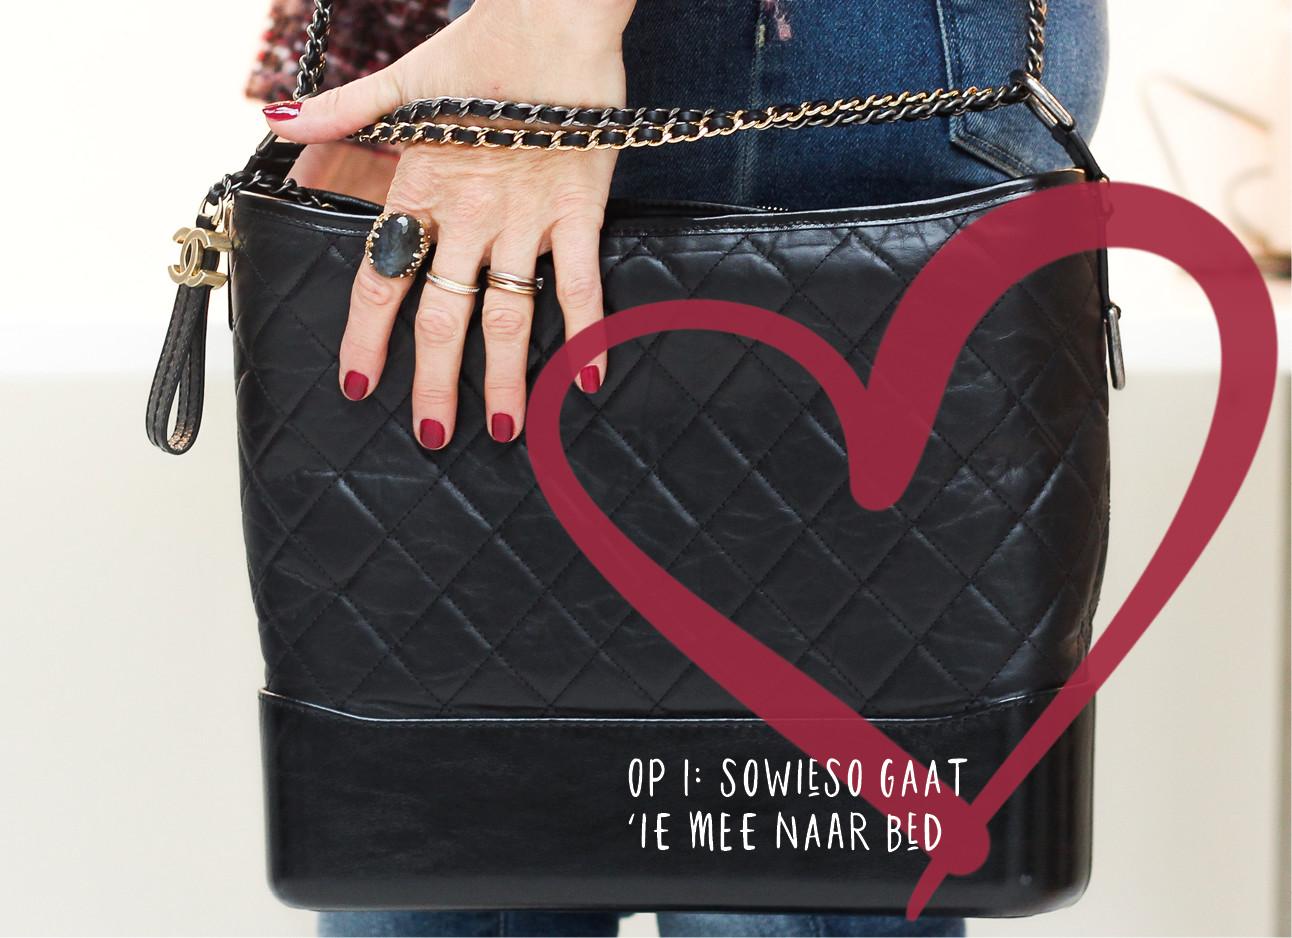 62cebf8351e Chanel tas van MAy-britt met rode nagelak op het grote ring om haar vingers